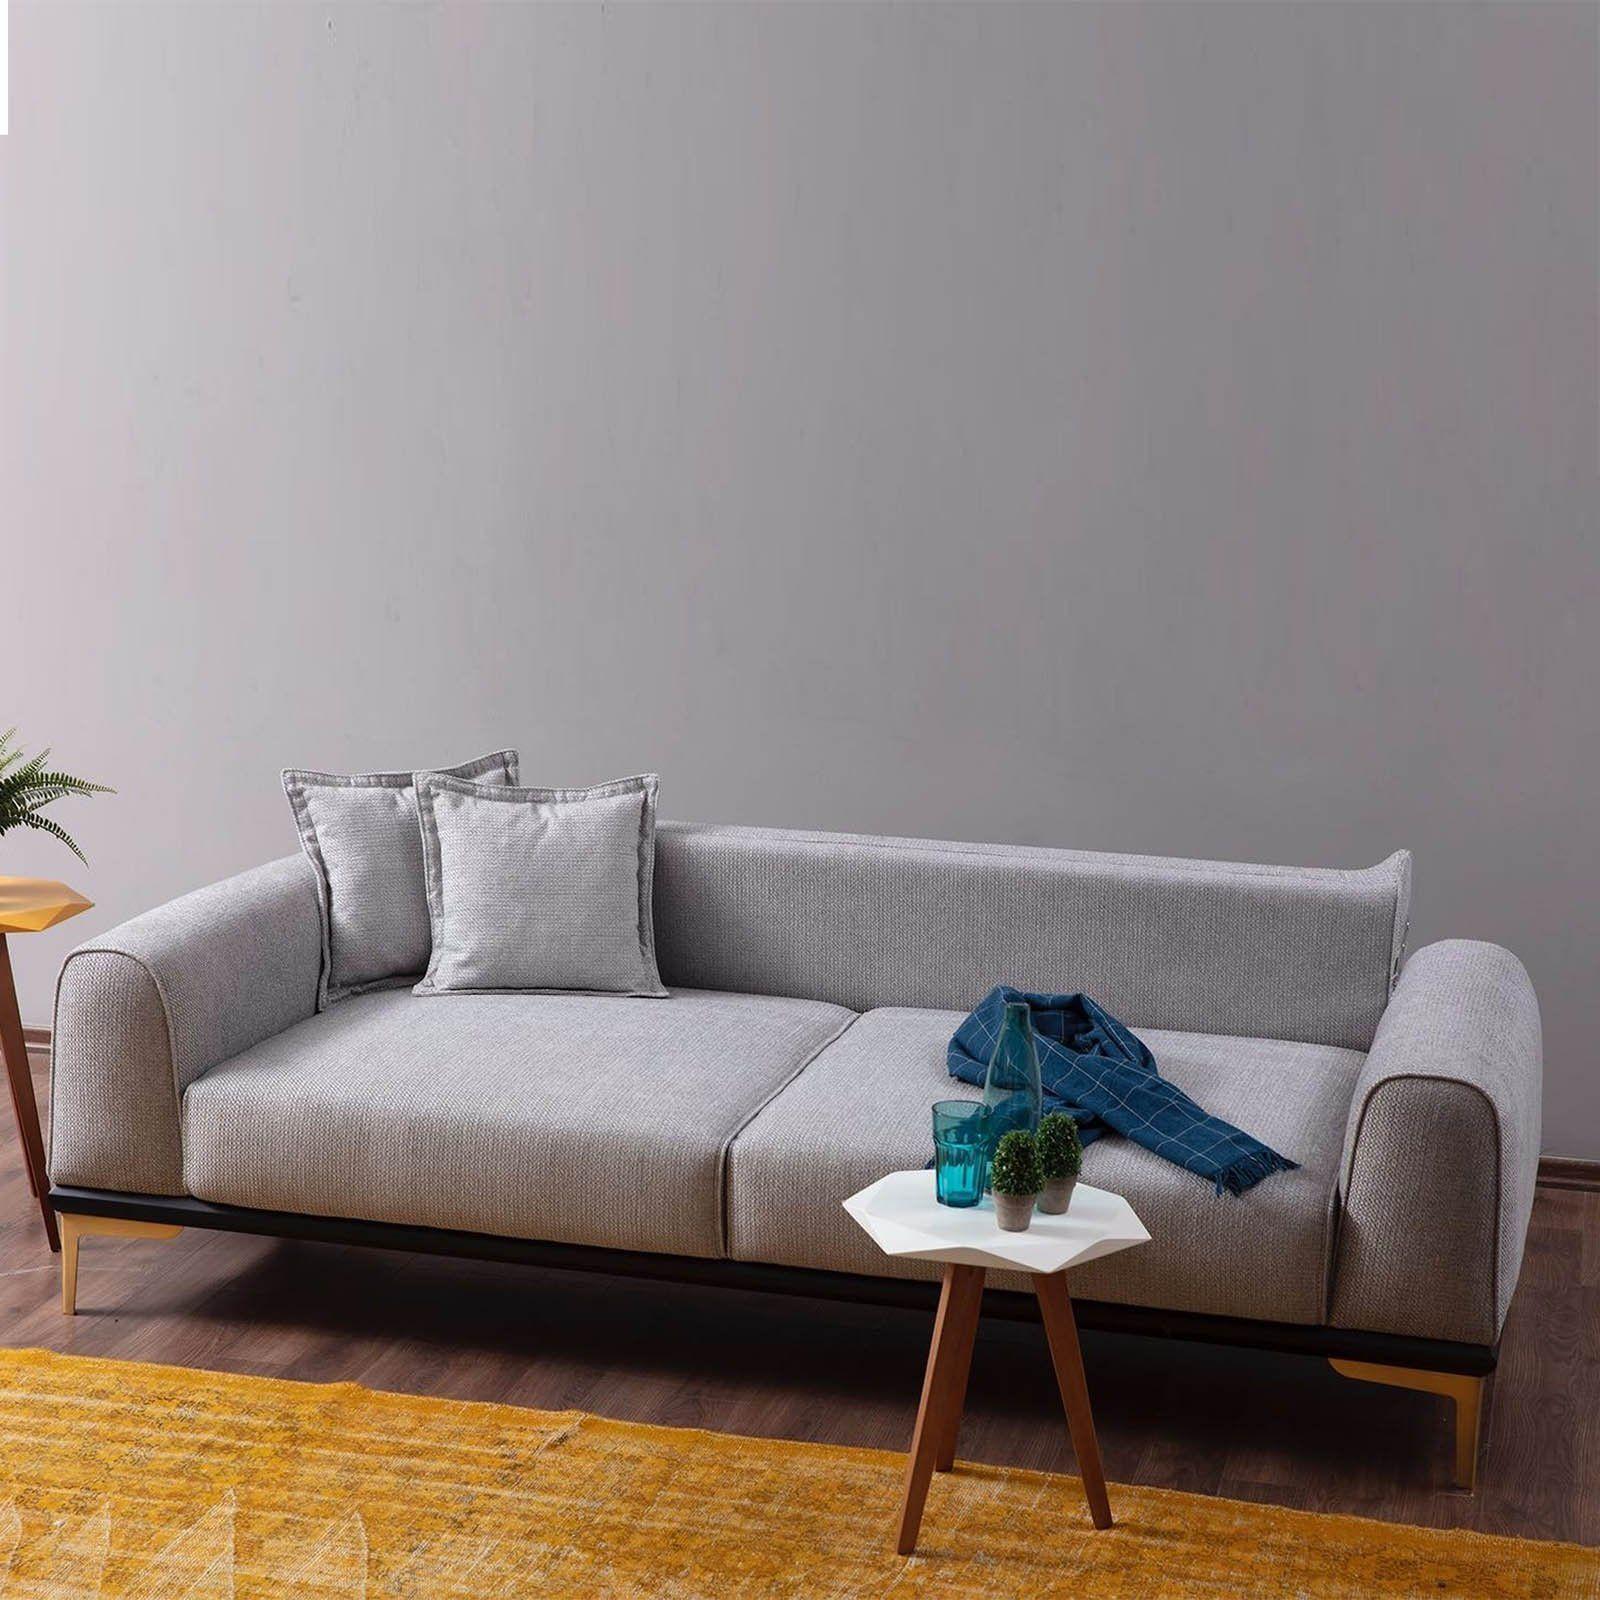 Pre Order 60 Days Delivery Nirvana 3 Seater Sofa Bed Nirv004 Cekyat Kanepeler Mobilya